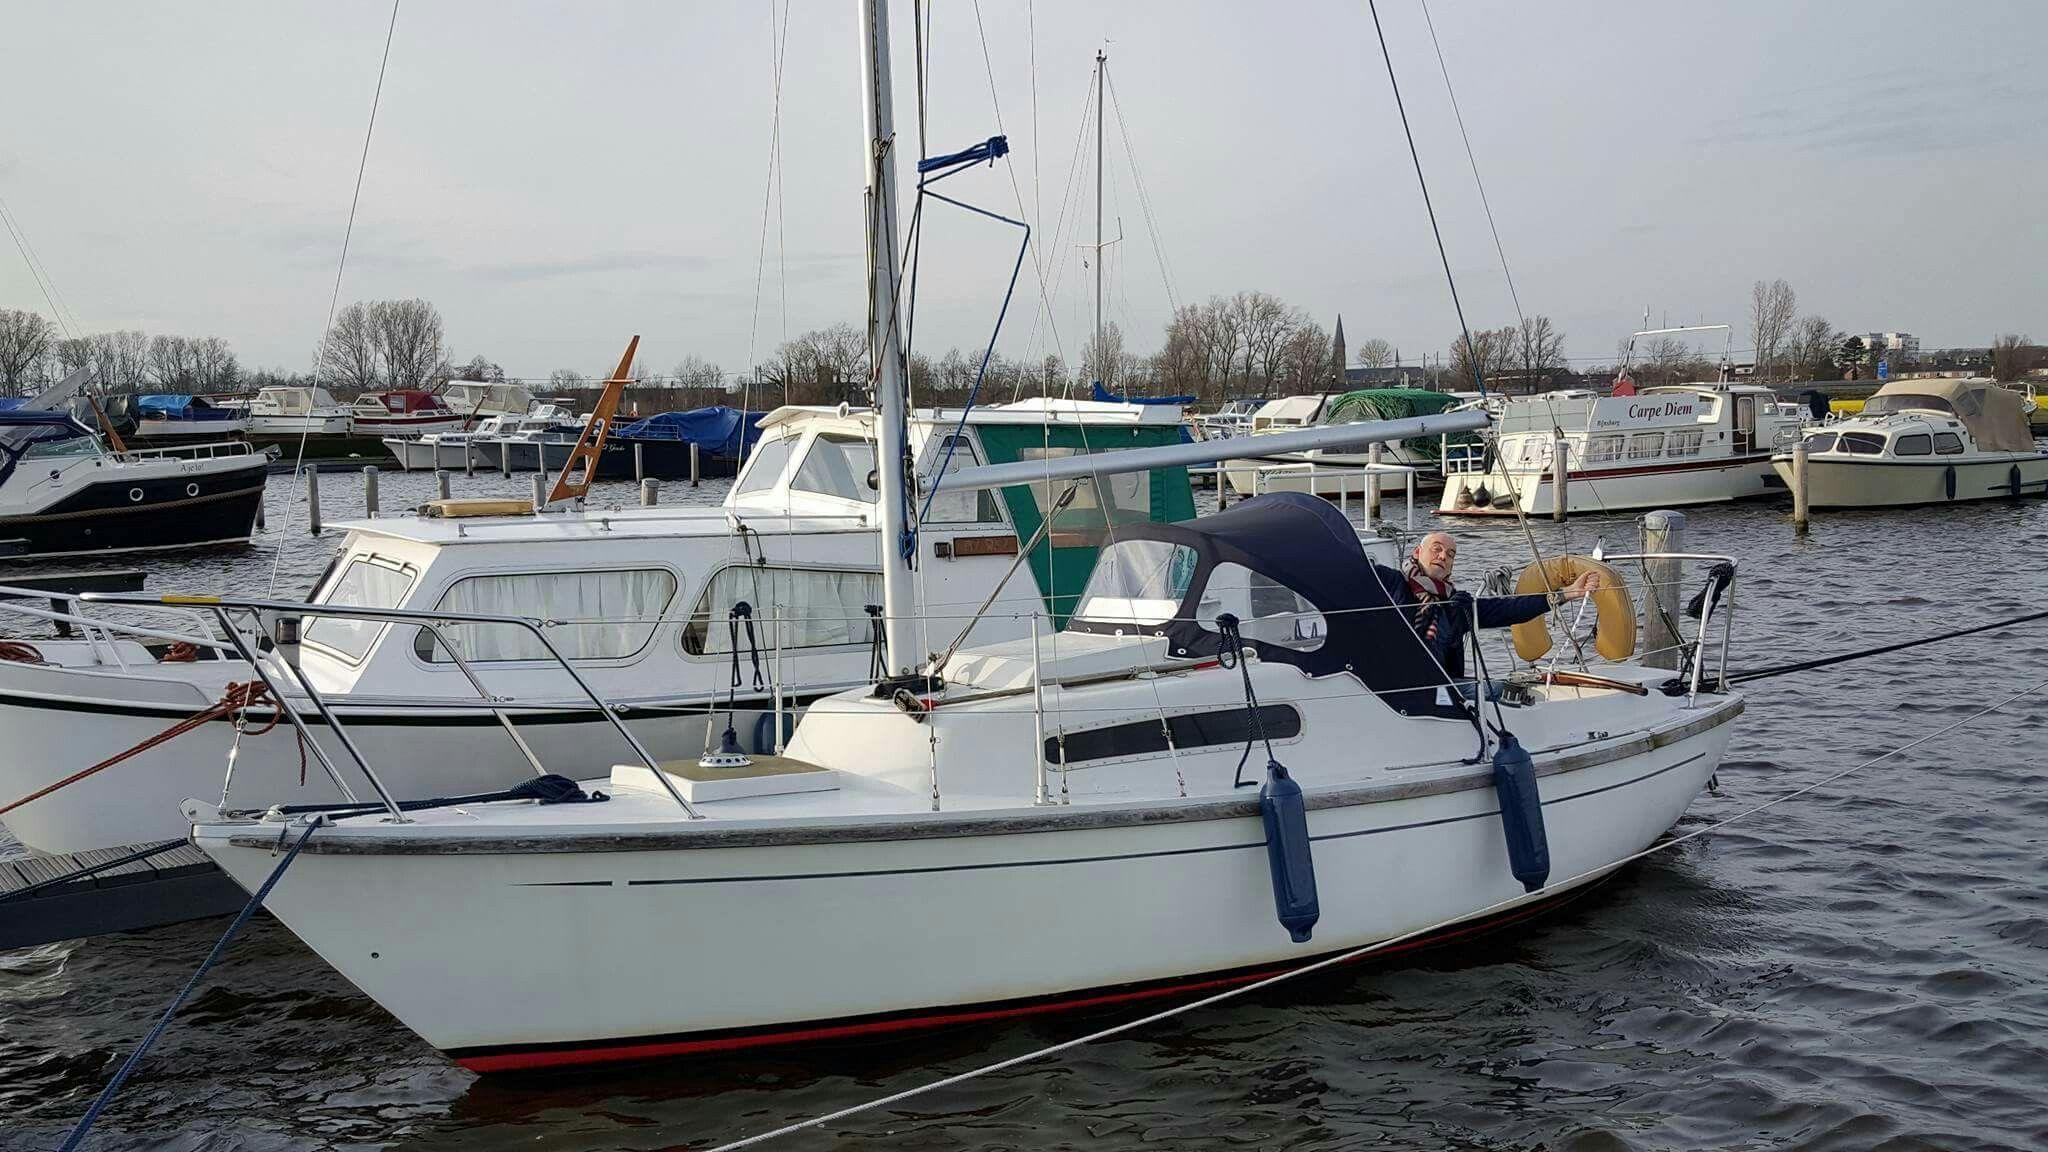 loopschoenen discountwinkel herfst schoenen Pin on Boats,ships